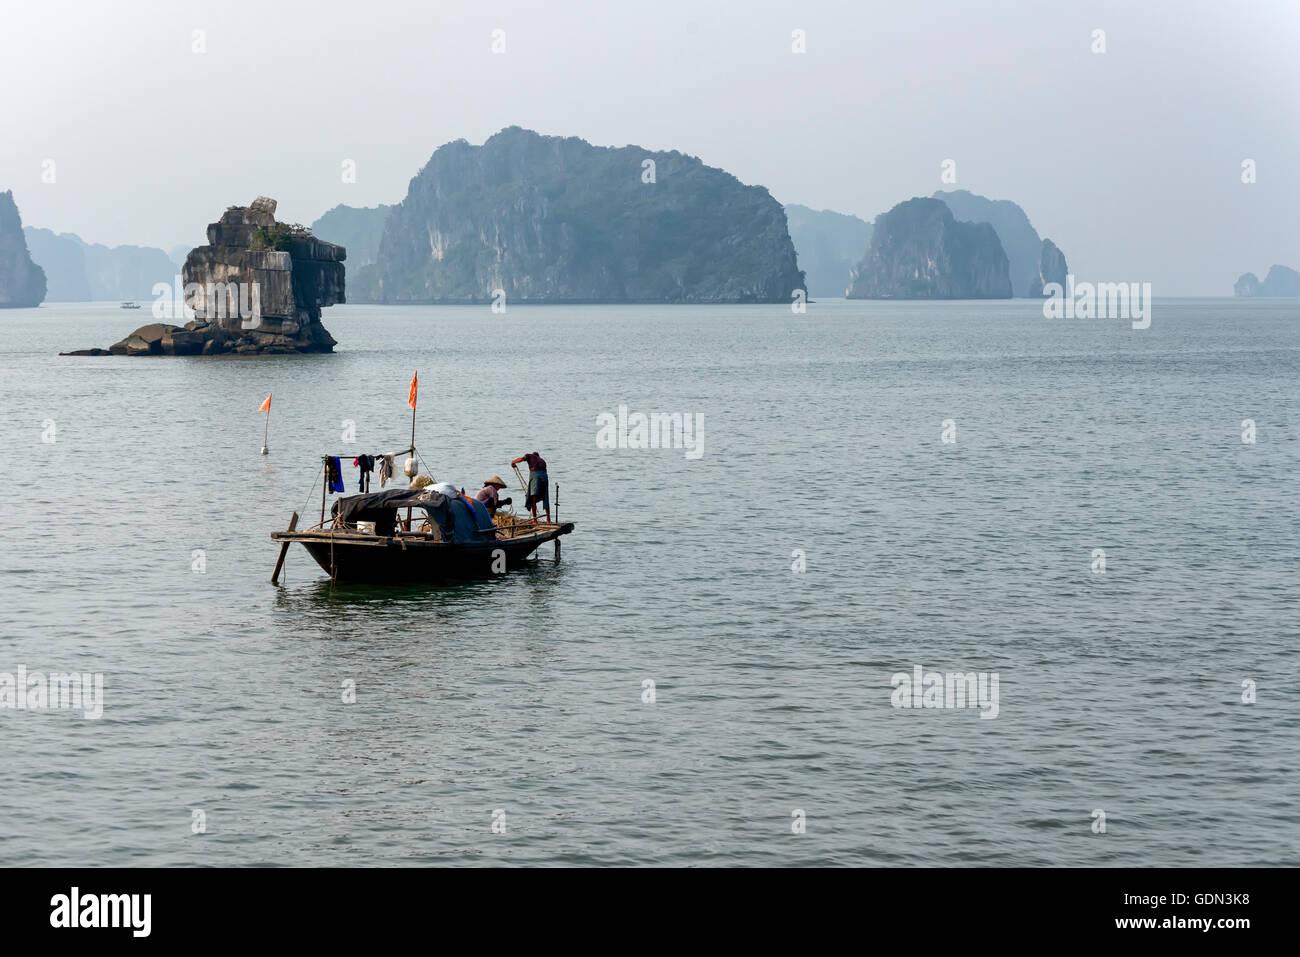 Fishing boat in Halong Bay - Stock Image